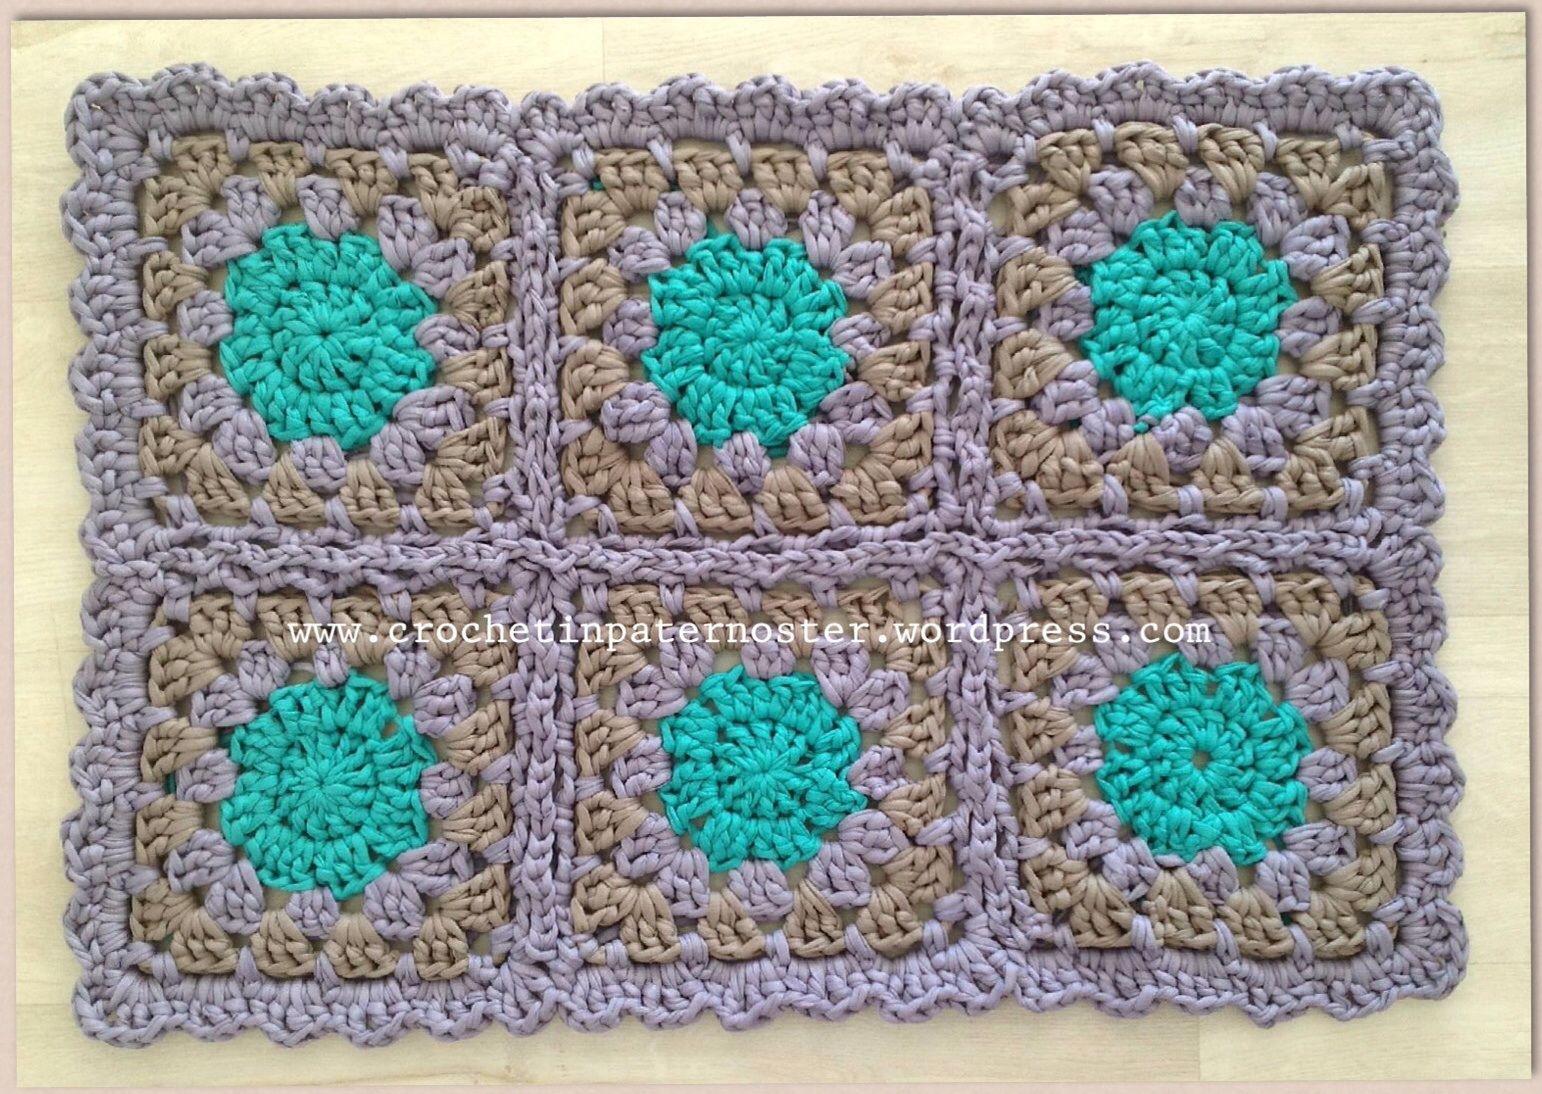 Crochet Granny Square Rug Patterns : granny square rug Crochet patterns Pinterest